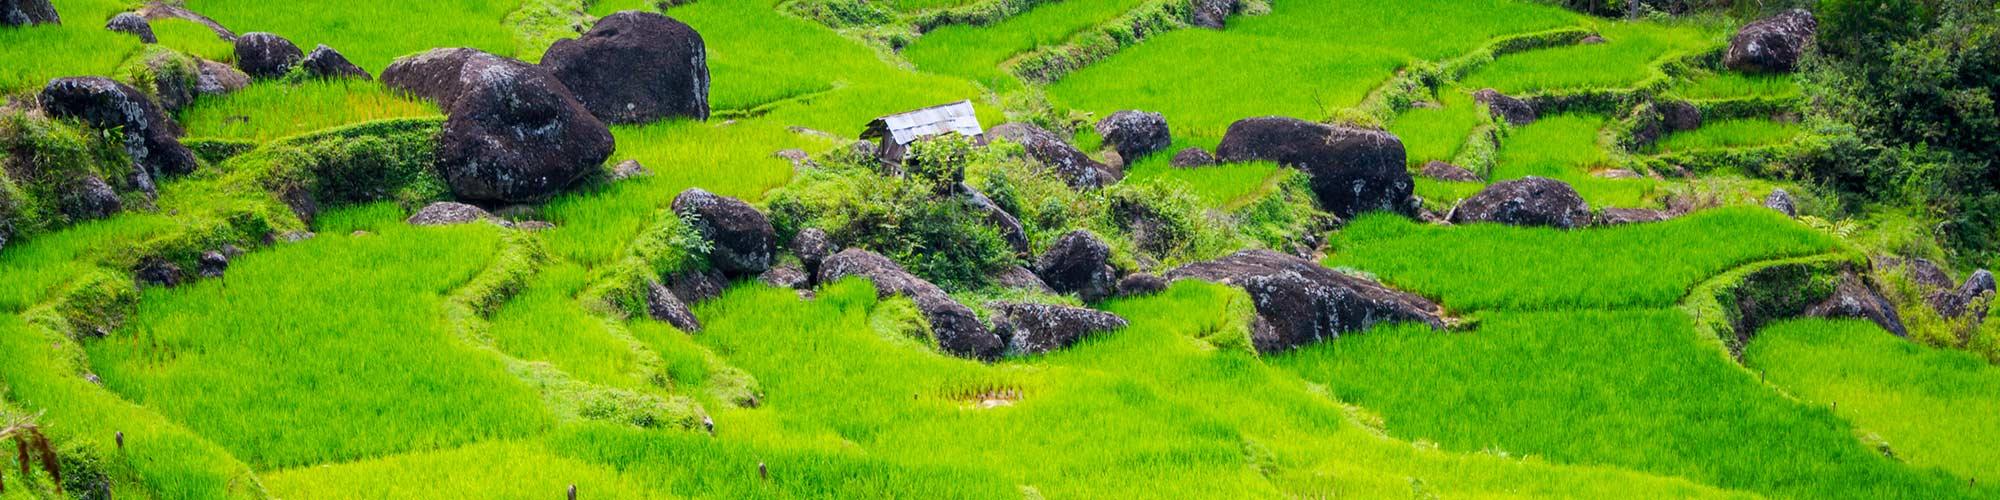 Campo de arroz campo, Sulawesi, Indonesia - El Pais Viajes